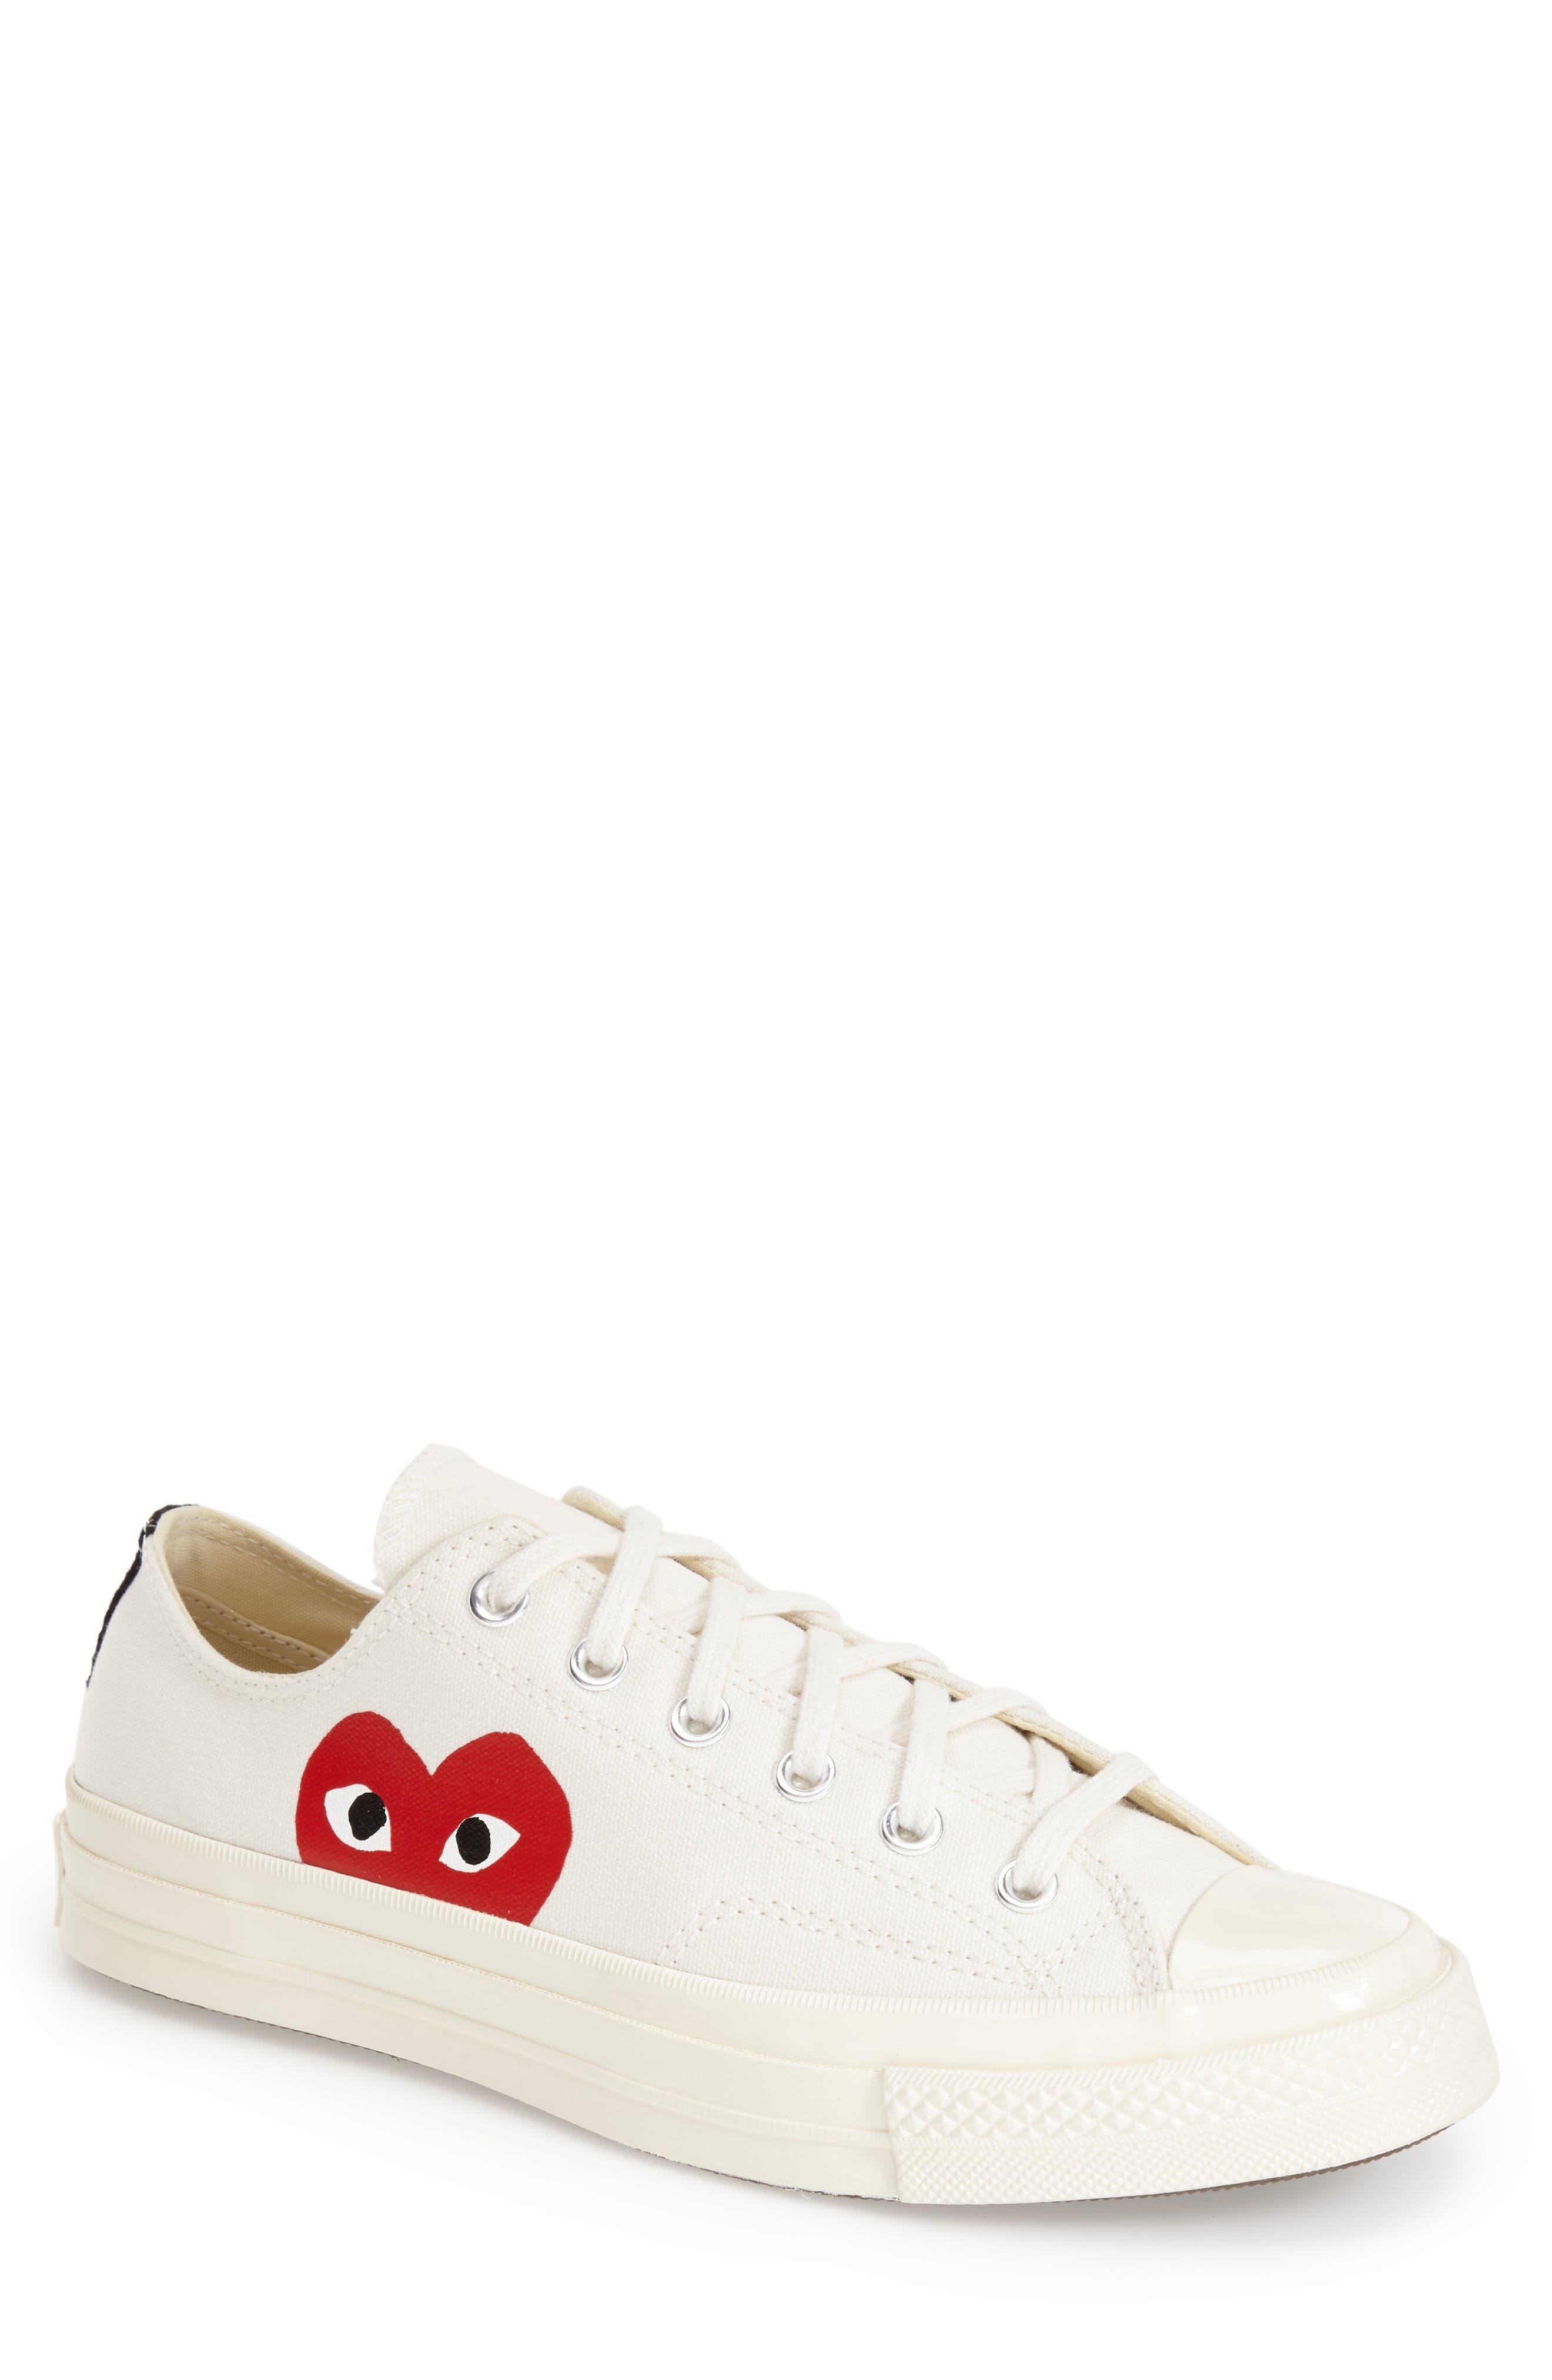 Comme des Garçons PLAY x Converse Chuck Taylor<sup>®</sup> Hidden Heart Low Top Sneaker,                             Main thumbnail 1, color,                             Beige